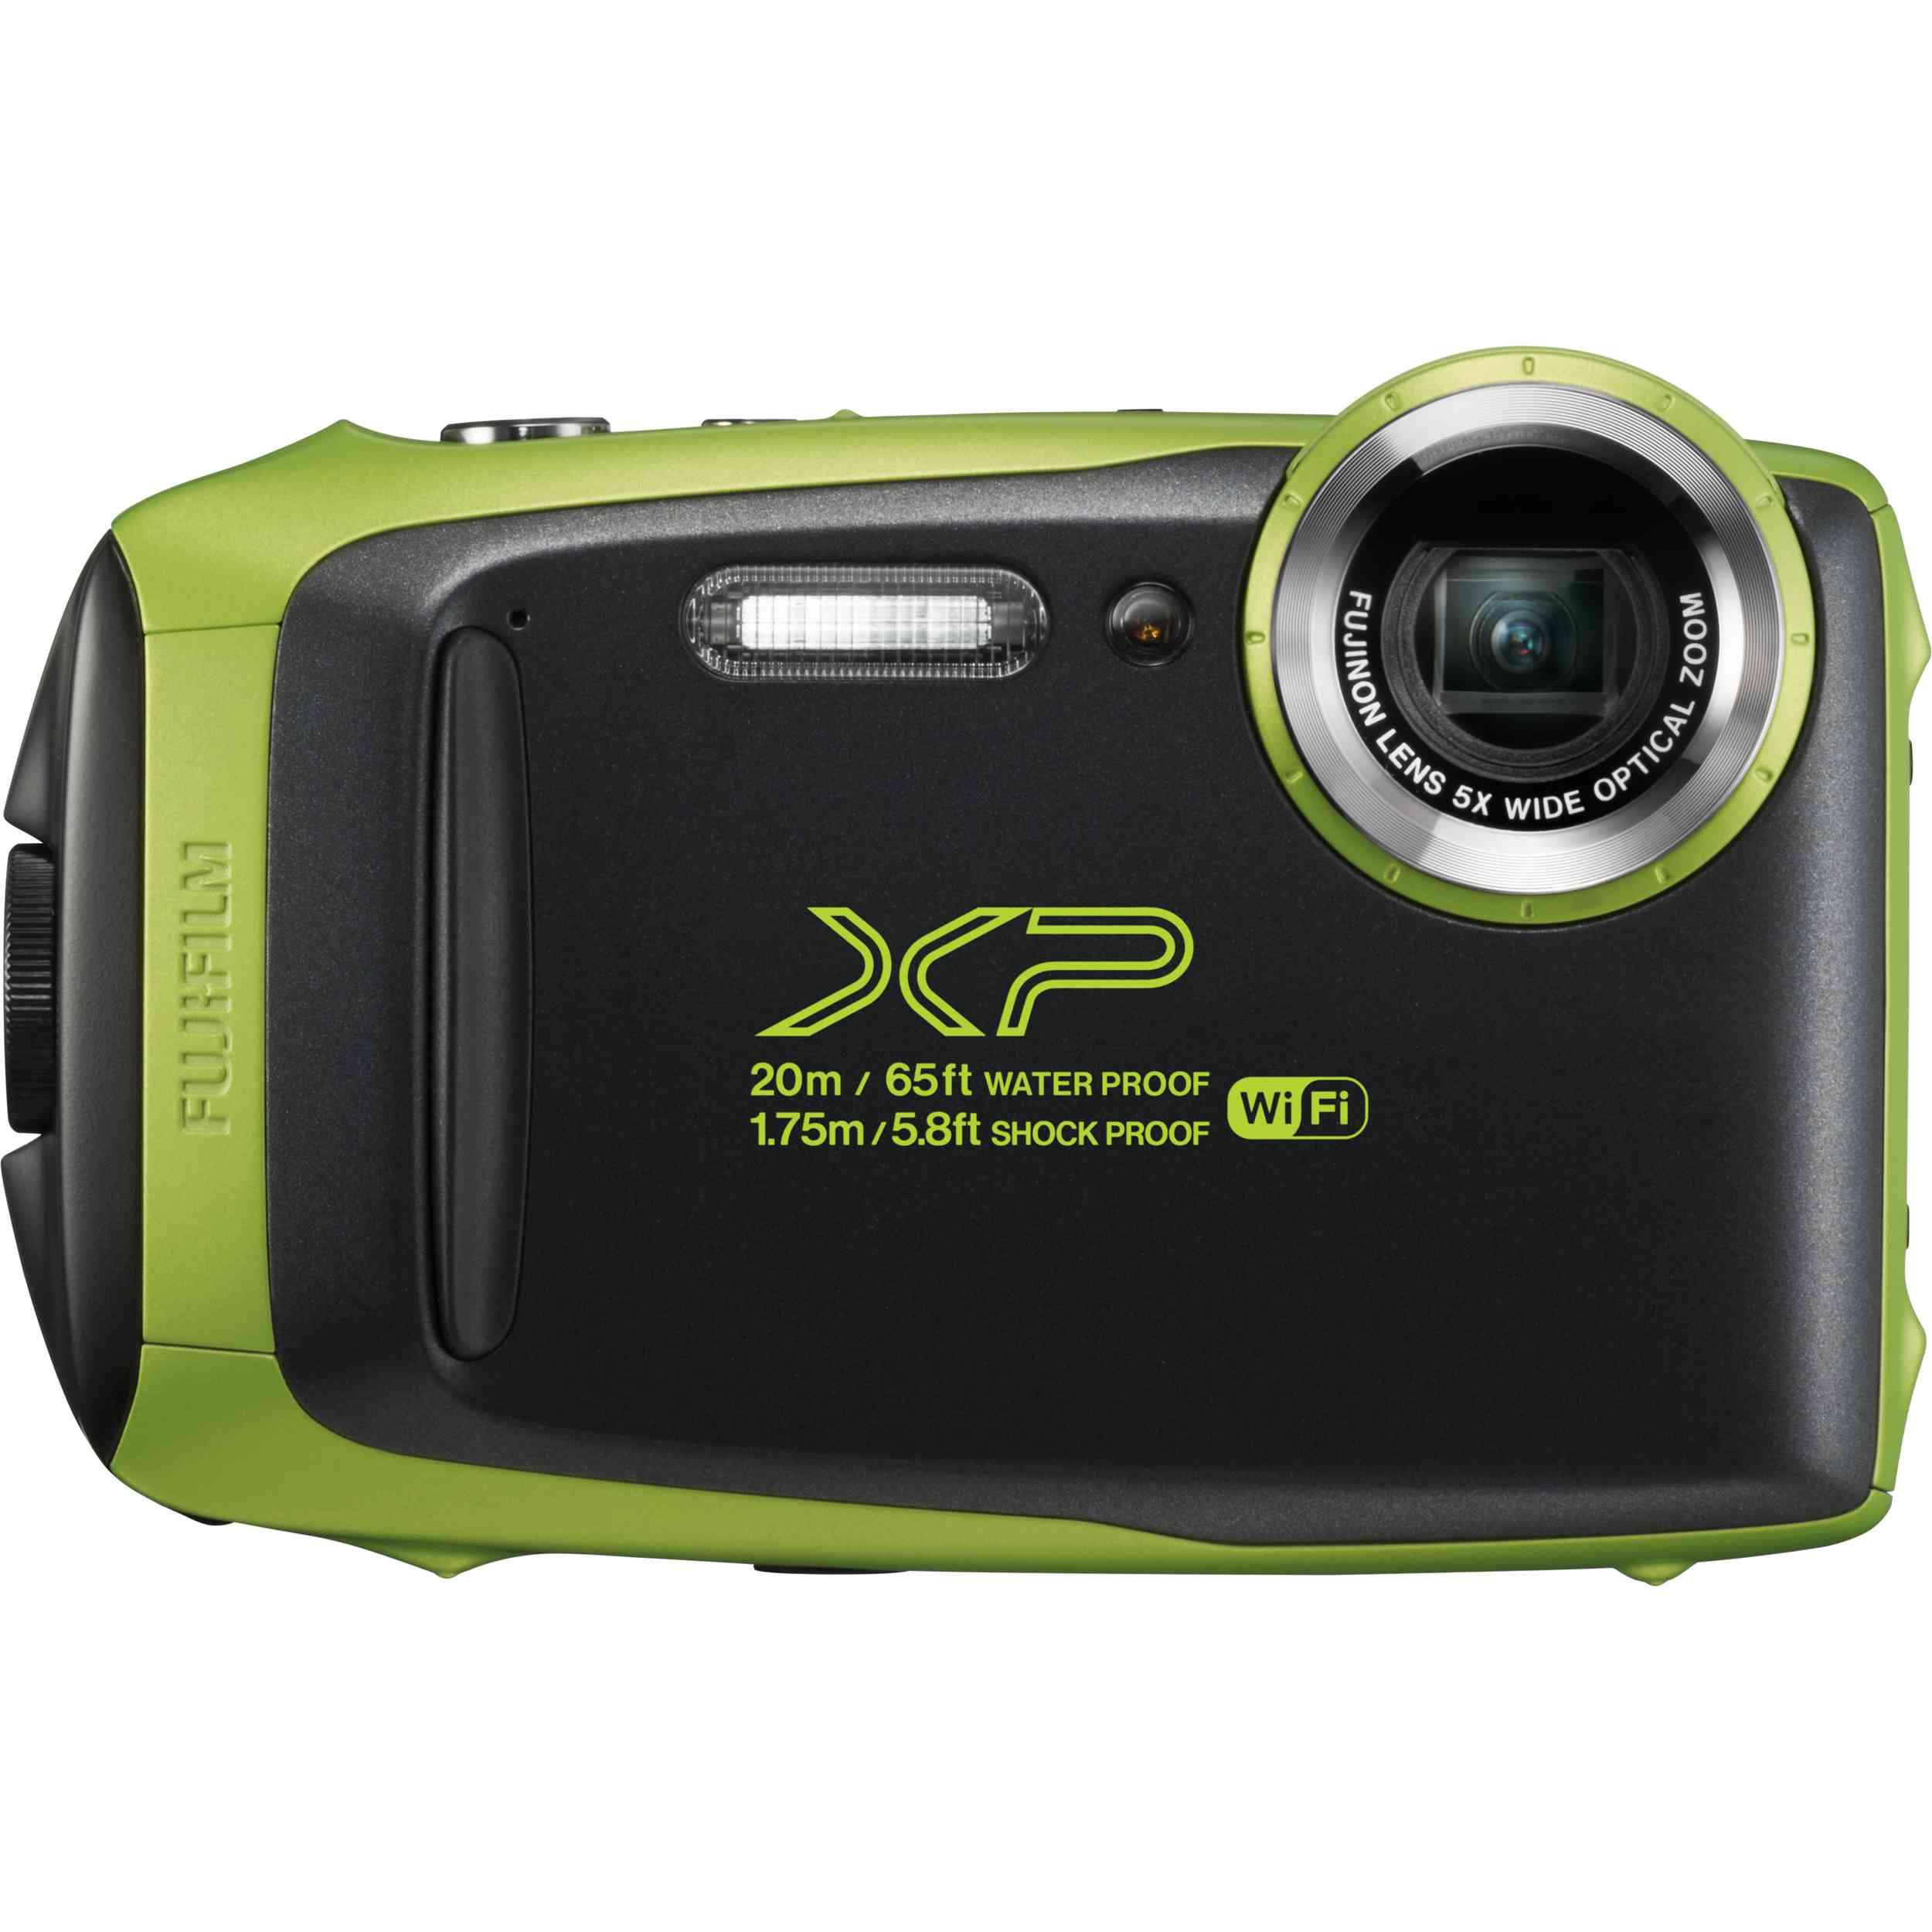 Fujifilm FinePix XP130